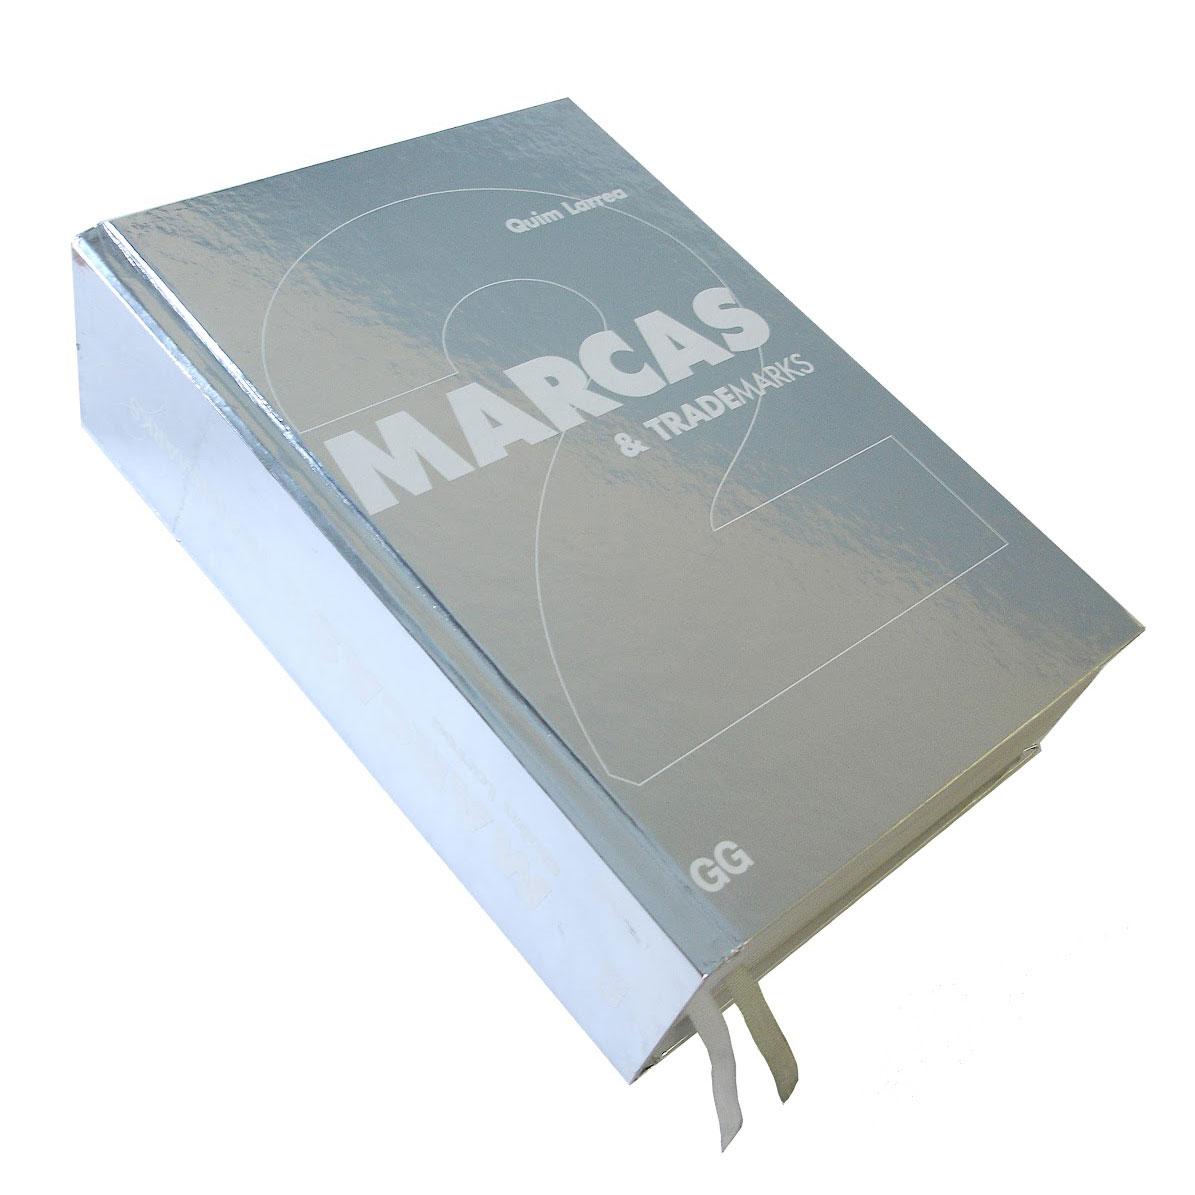 Marcas & Trademarks